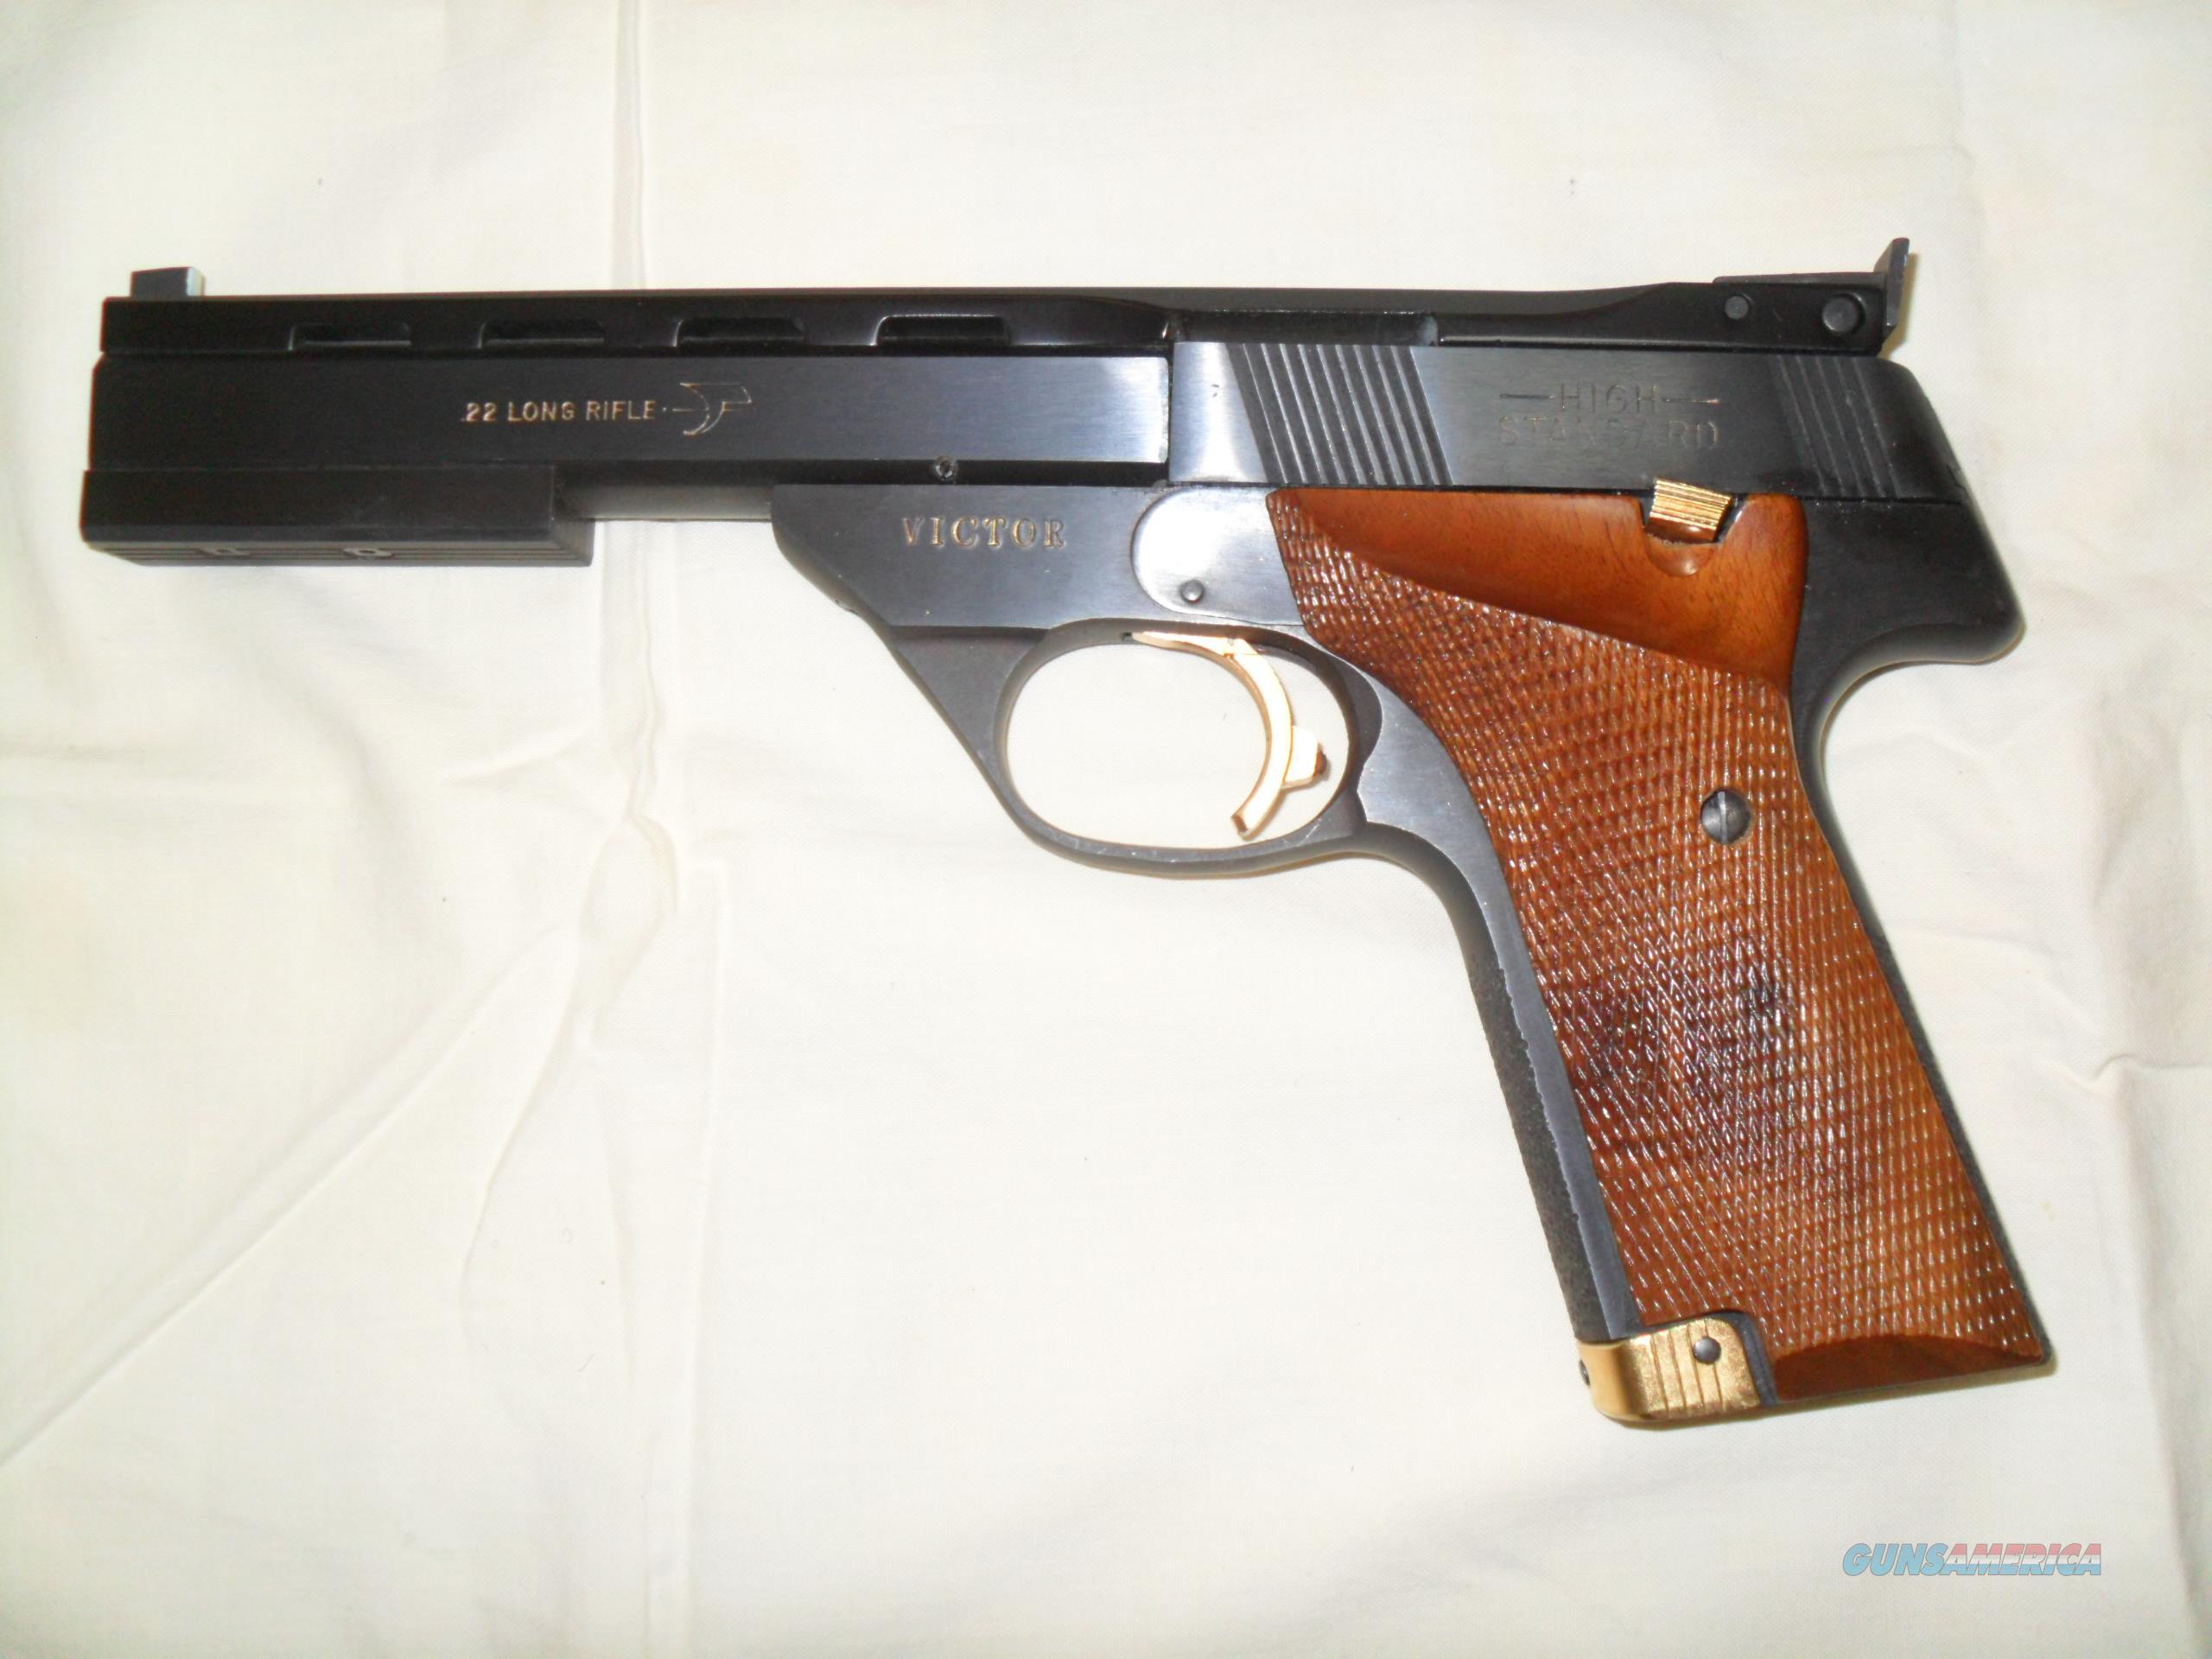 High Standard Victor .22 Target Pistol 5.5inch Barrel   Guns > Pistols > High Standard Pistols